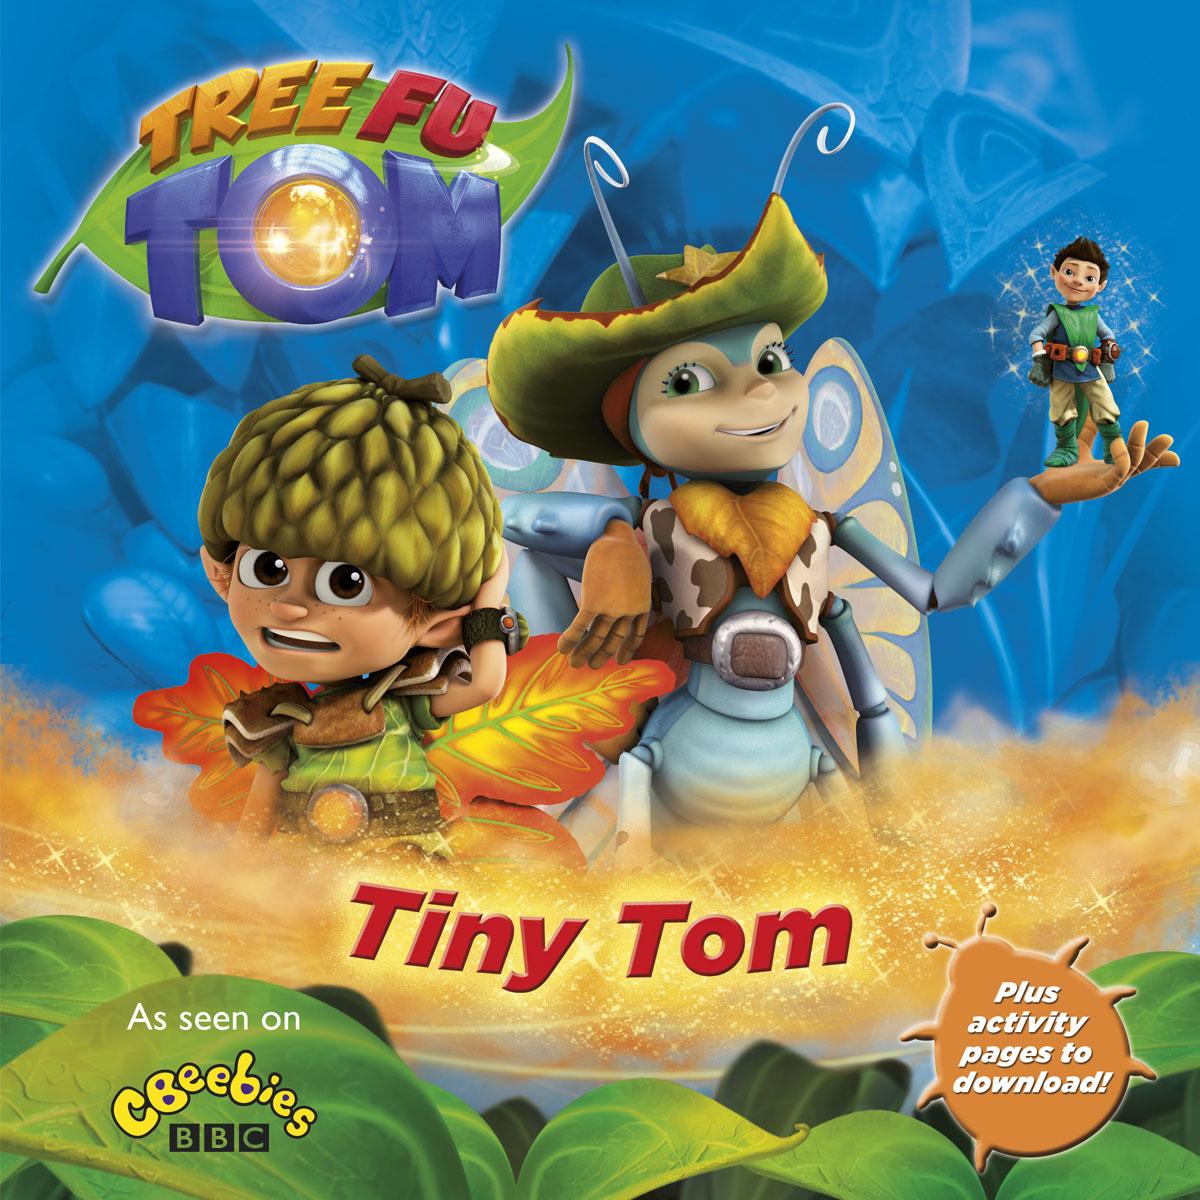 Tree Fu Tom: Tiny Tom